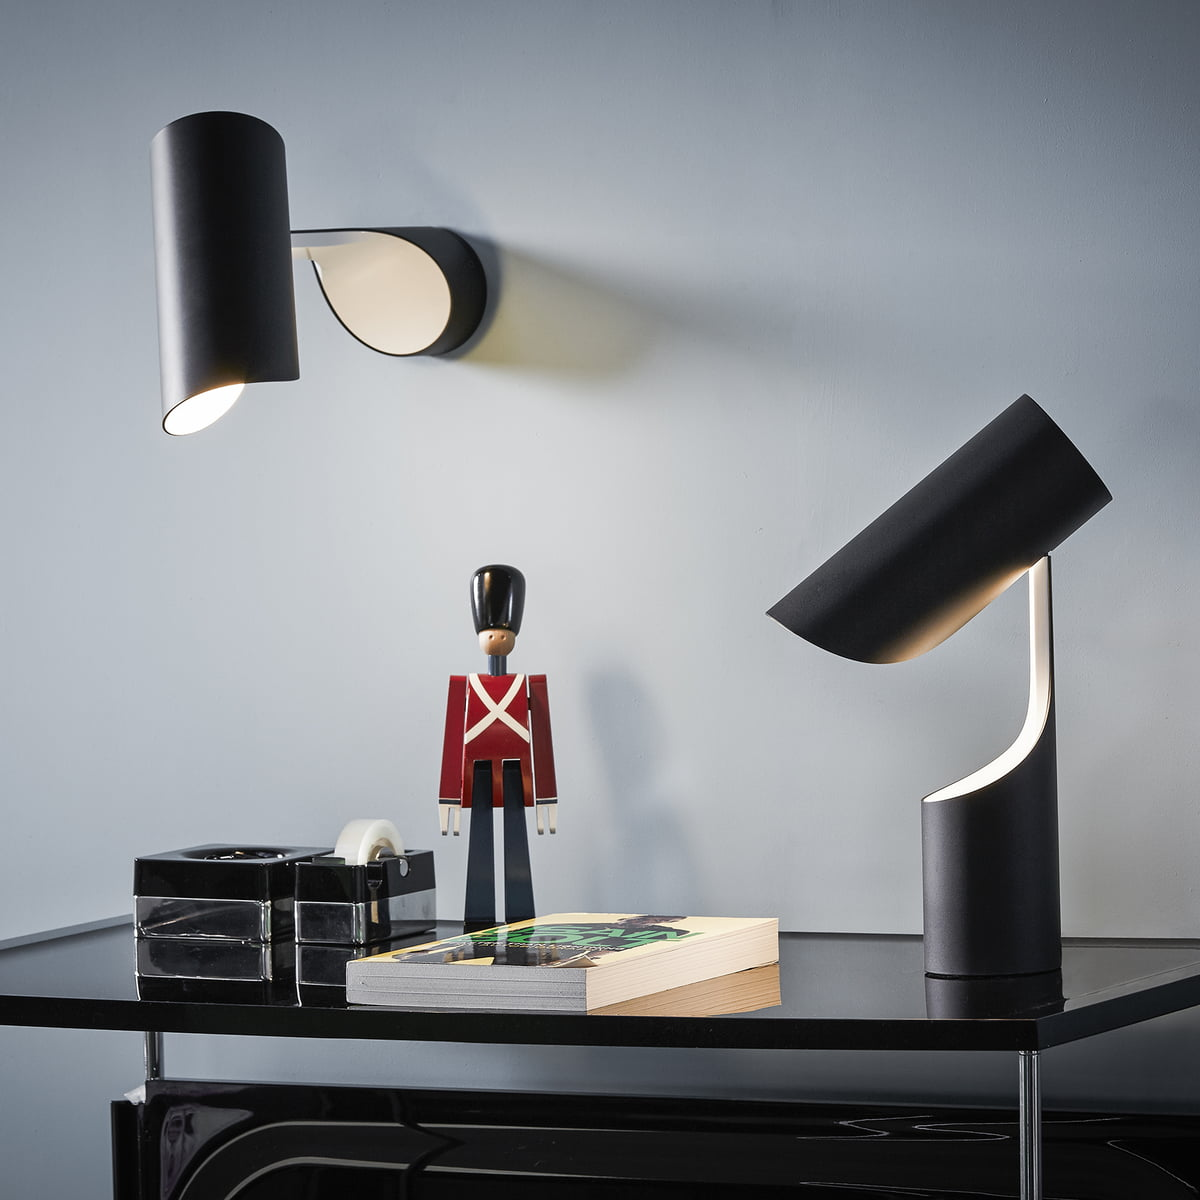 le klint lighting. Mutatio Lights Series By Troels · Wall Lamp Le Klint Lighting N